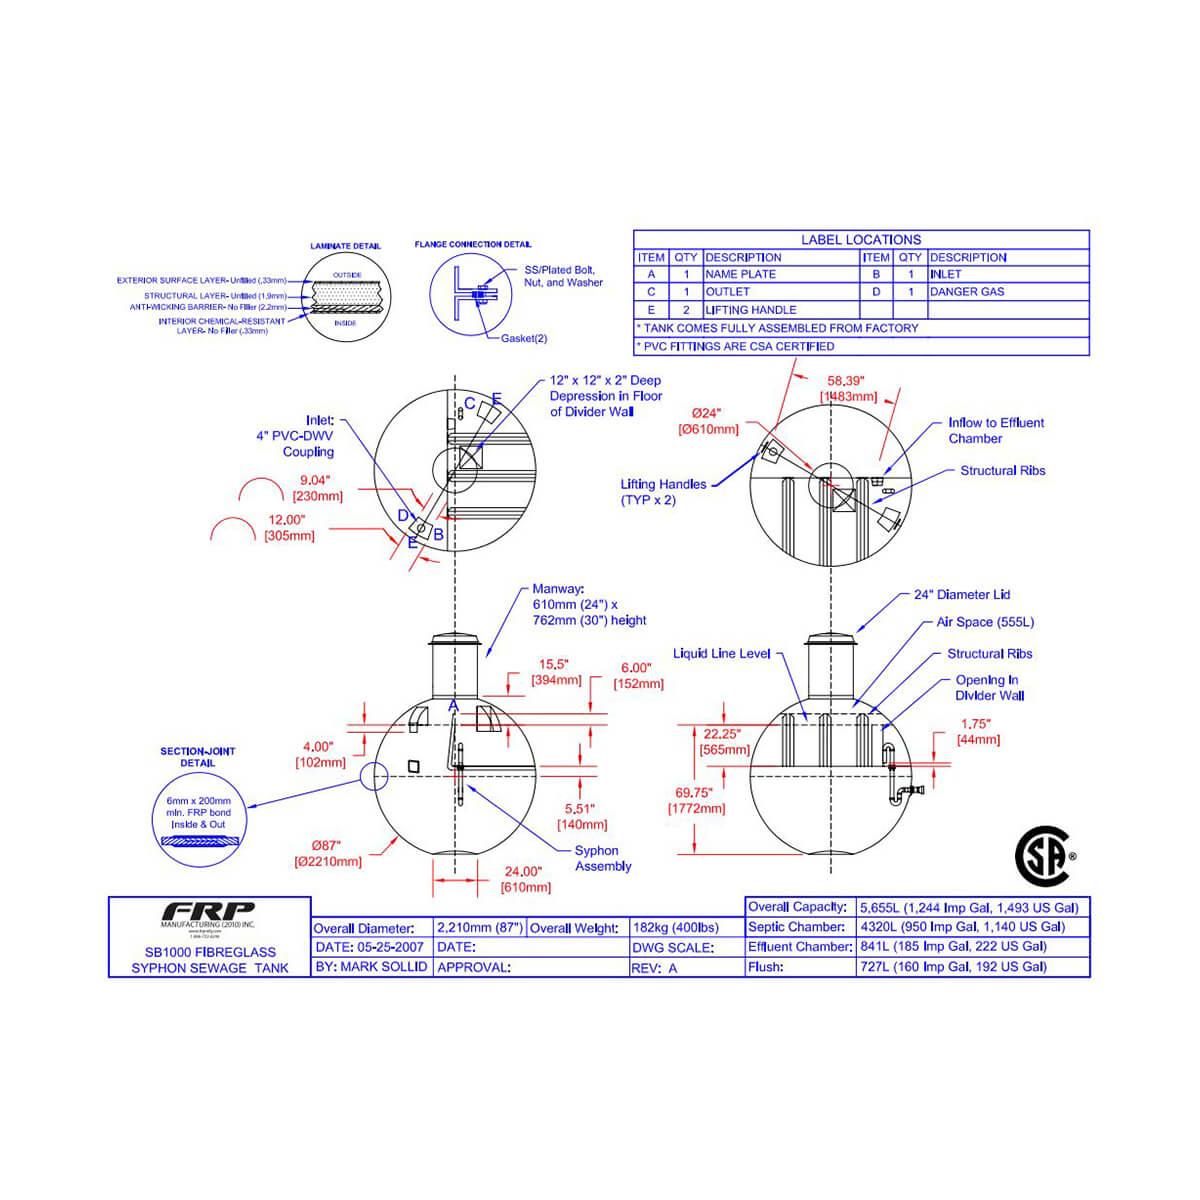 SB1000 Fibreglass Syphon Sewage Tank